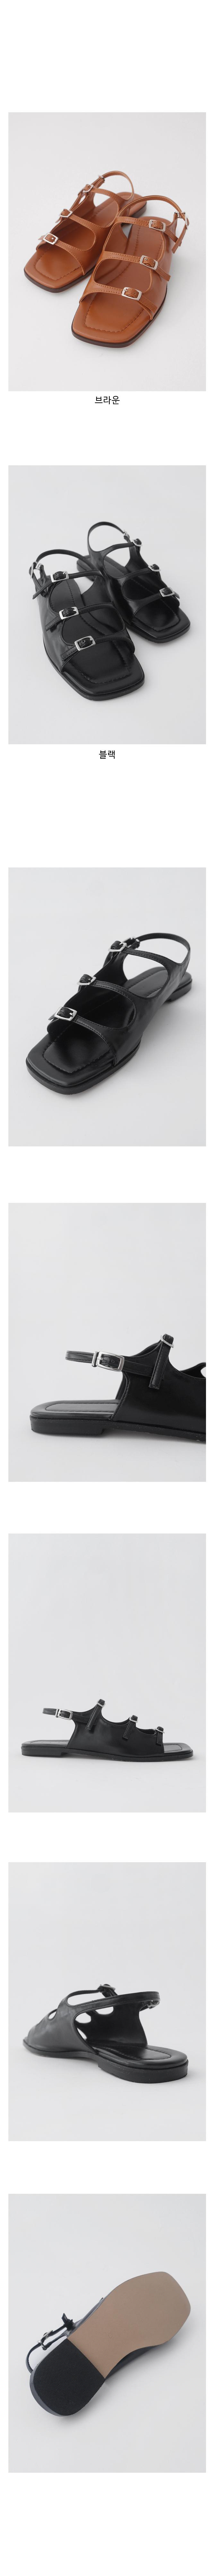 parallel strap buckle sandal